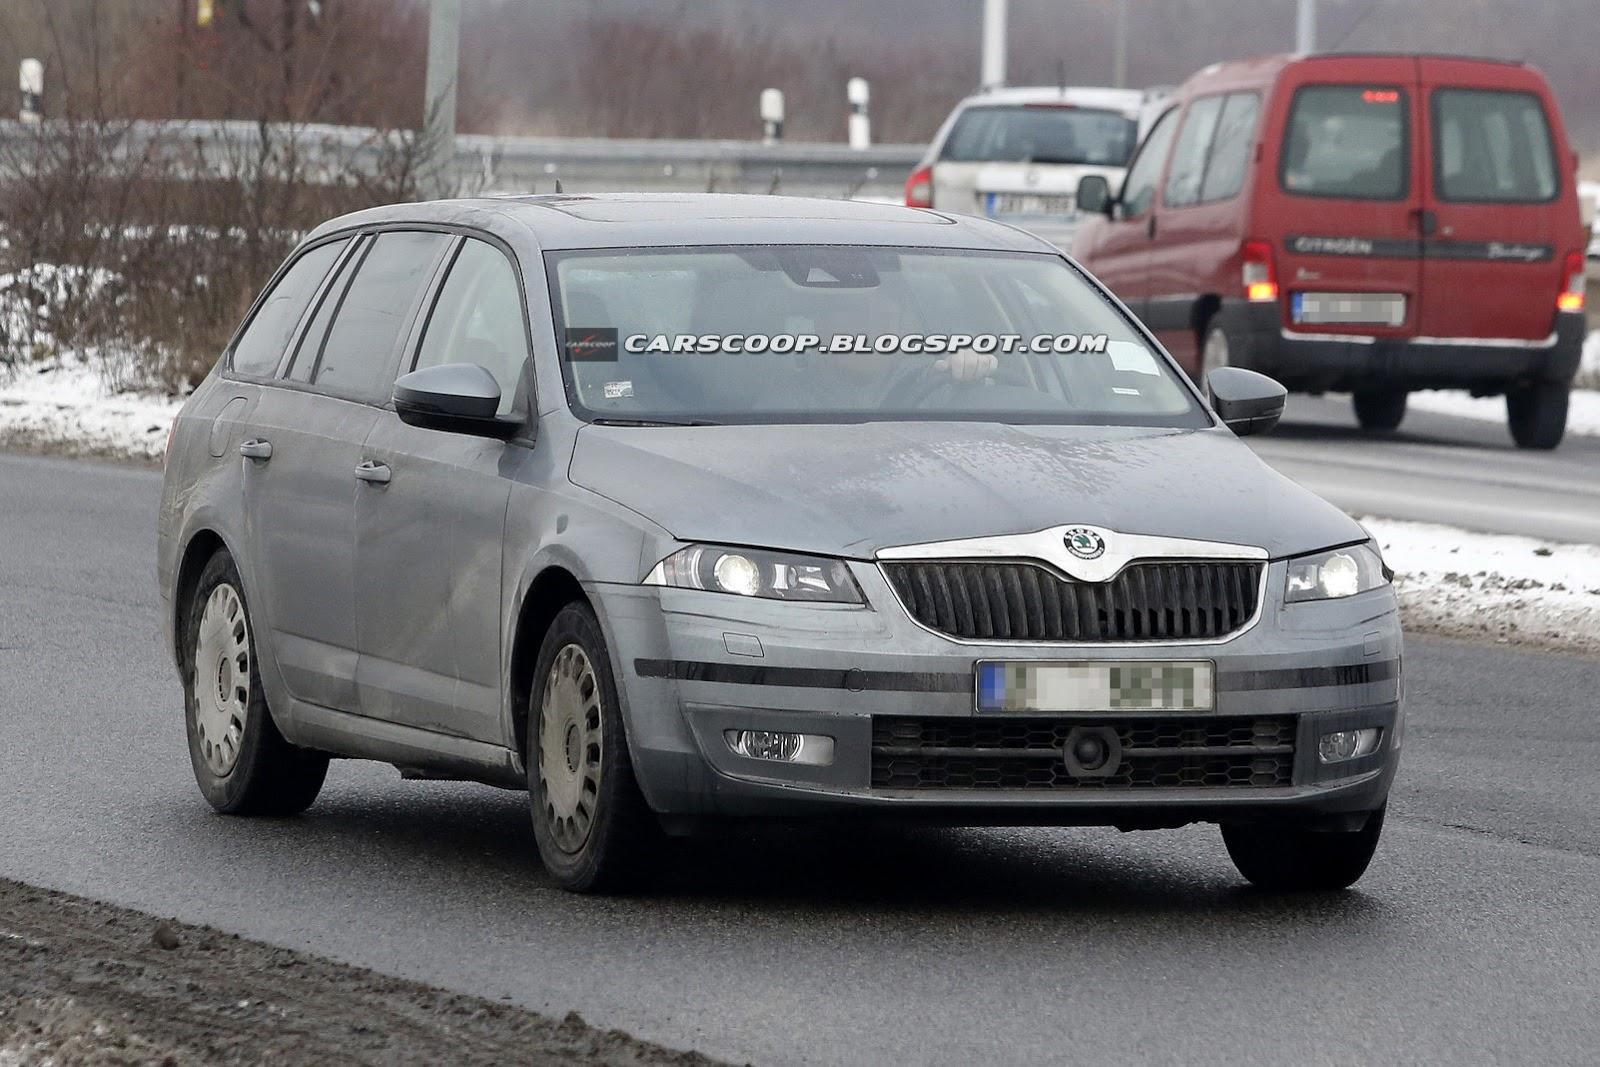 Spy Shots: New Skoda Octavia Combi Caught on Public Roads | Carscoop ...